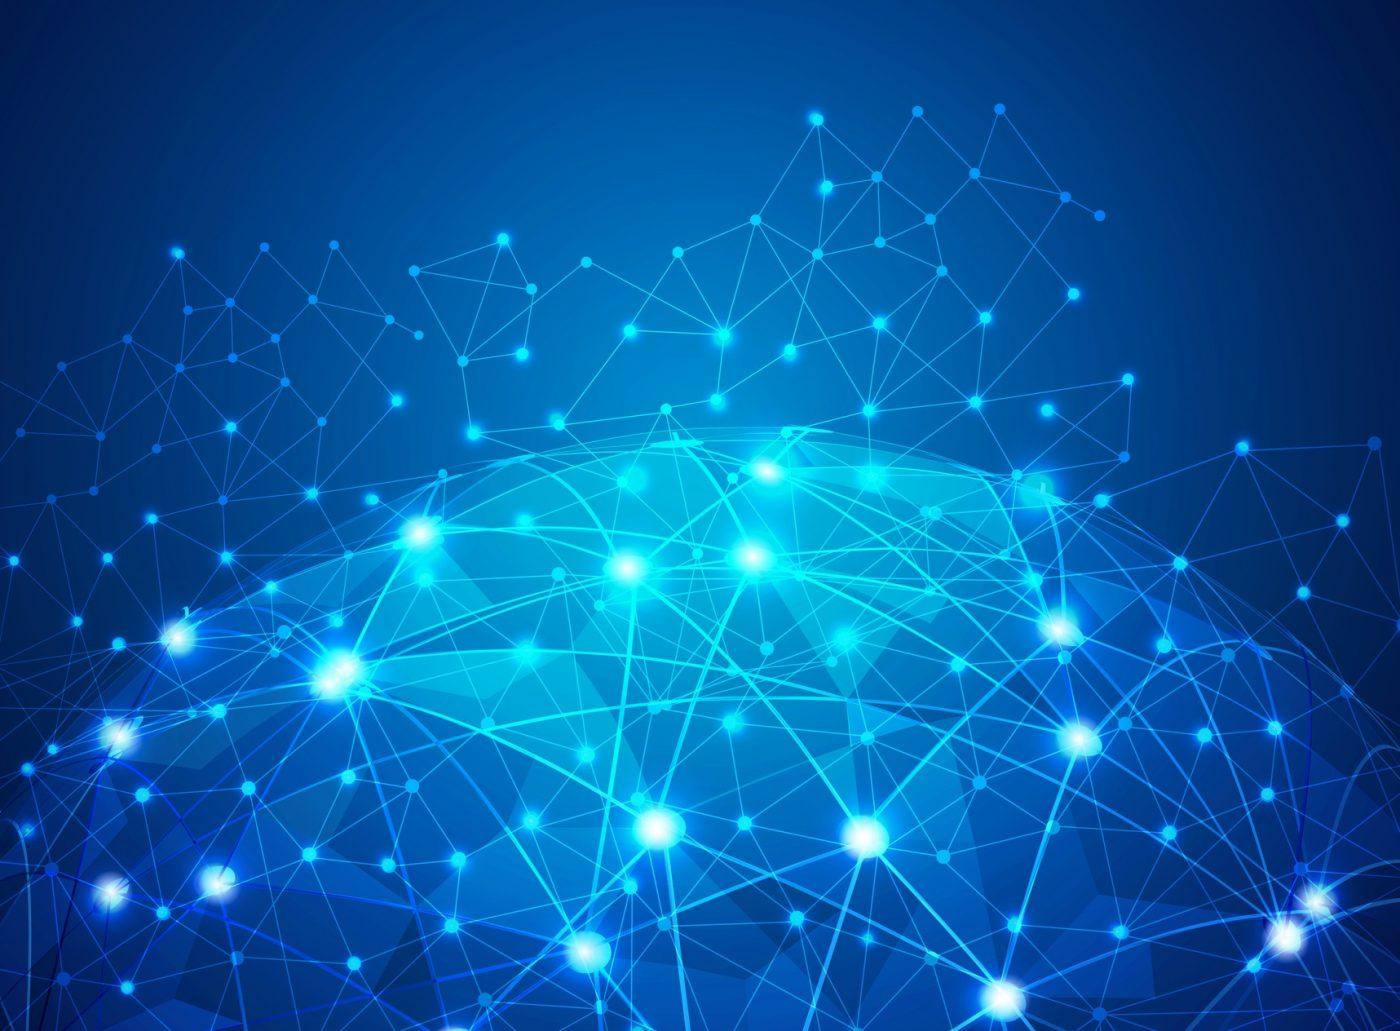 Spherical global digital mesh network background